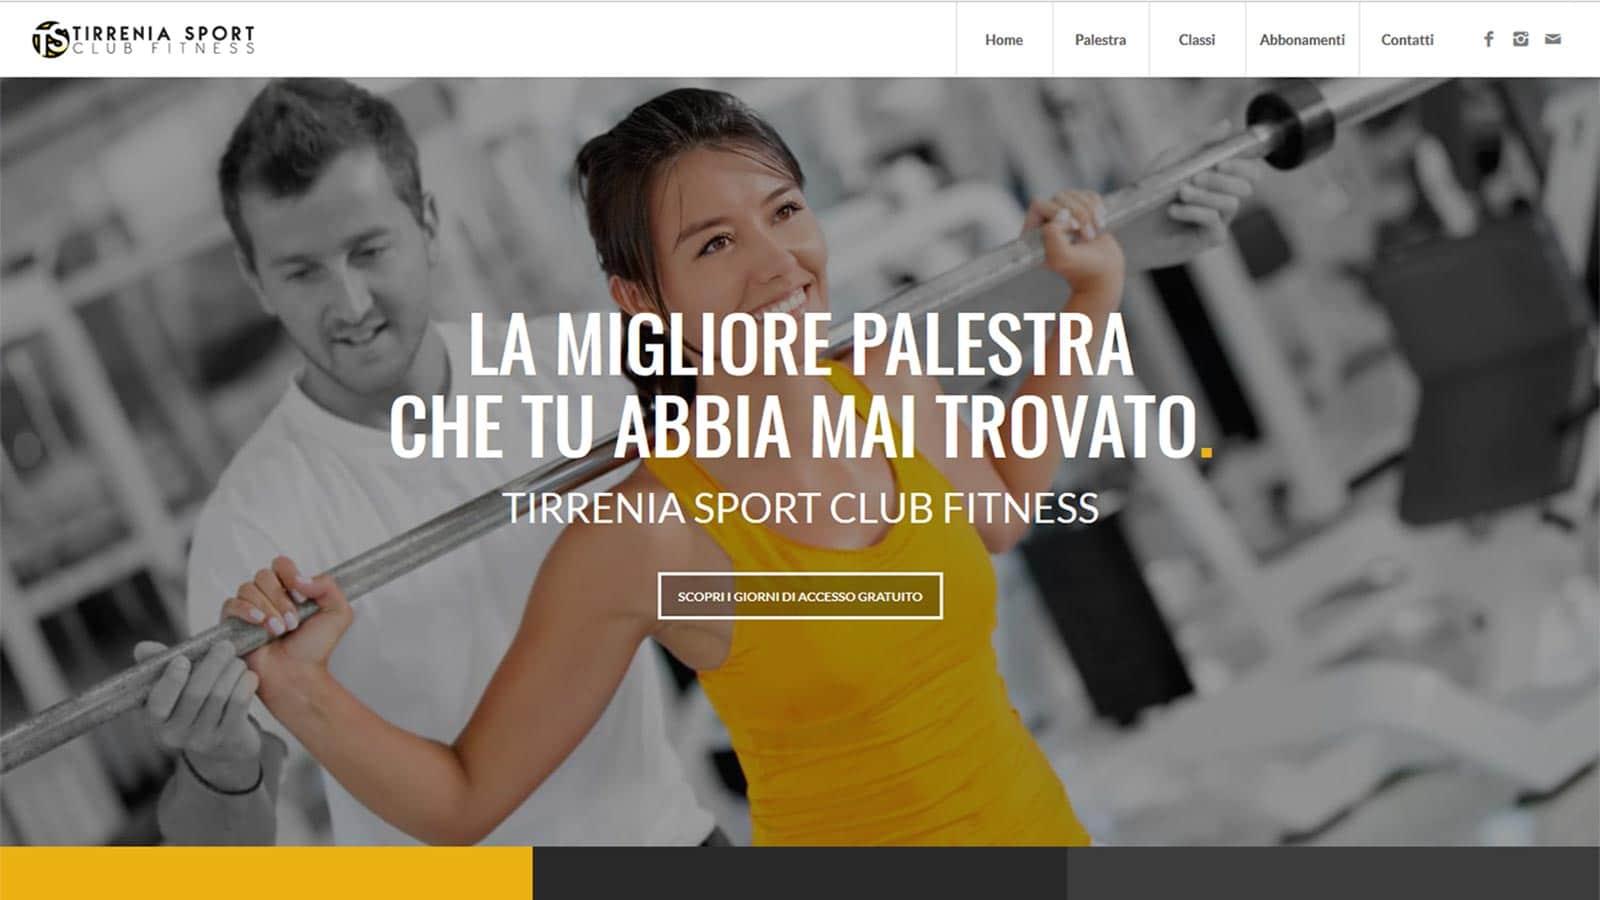 www.tirreniasport.it